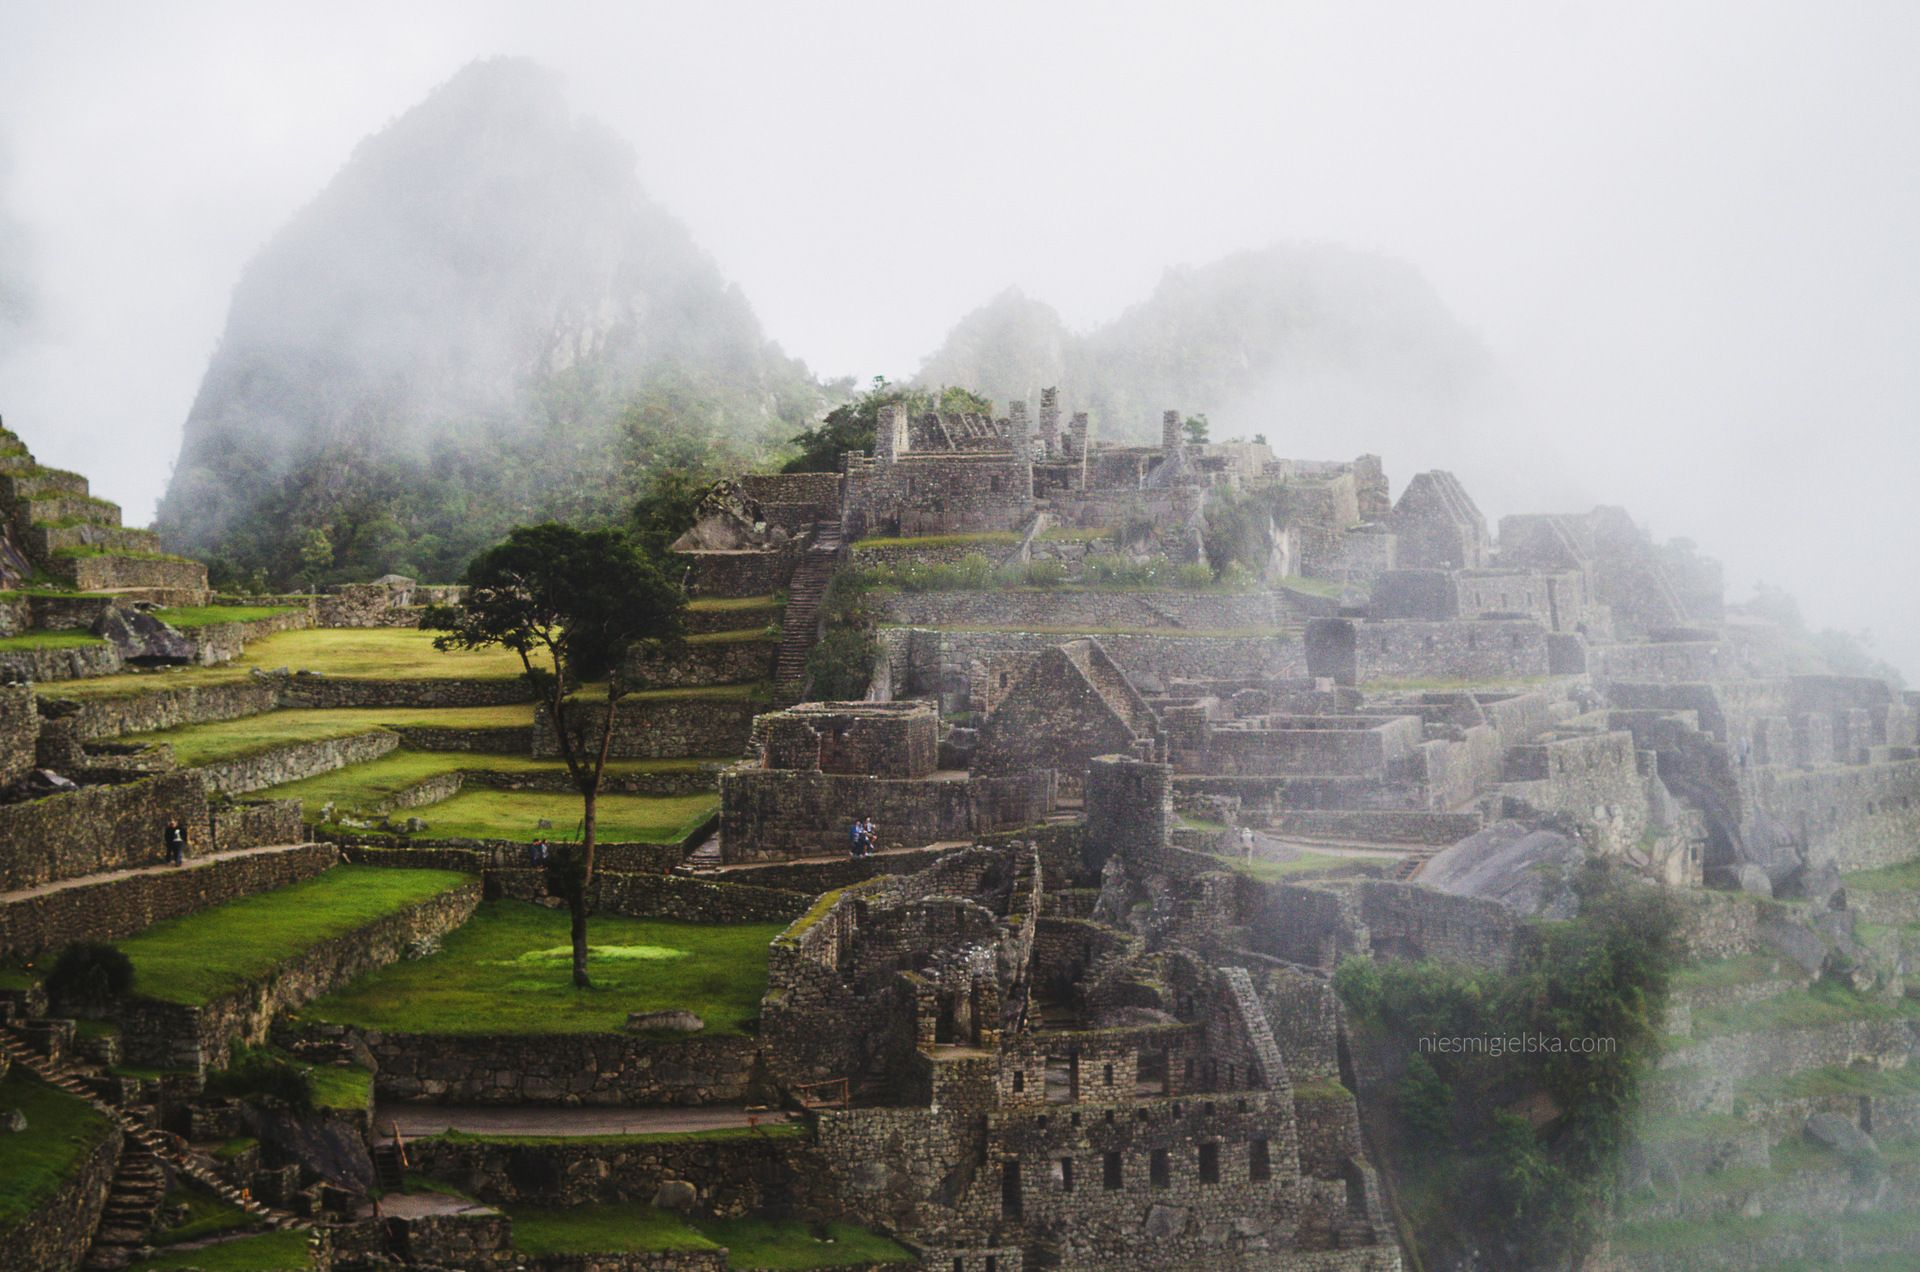 Machu Picchu by Niesmigielska.com